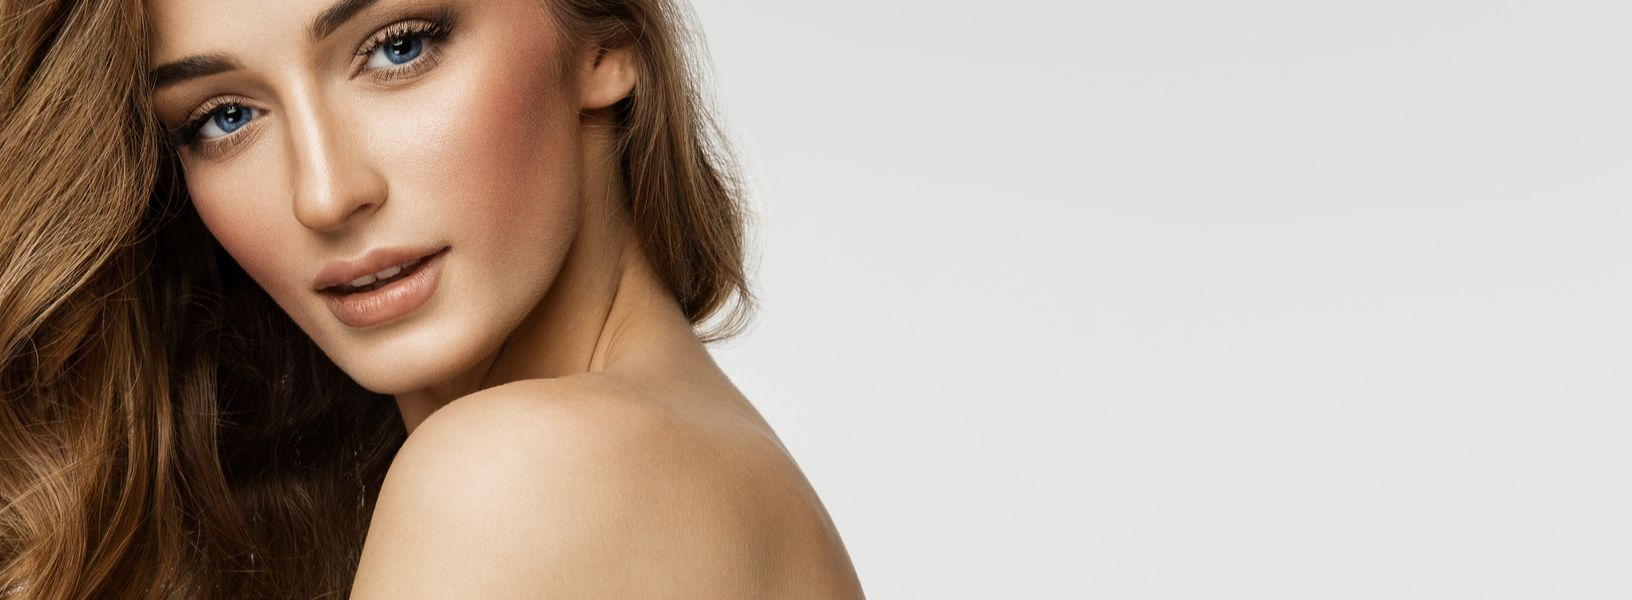 Rejuvenating the breast